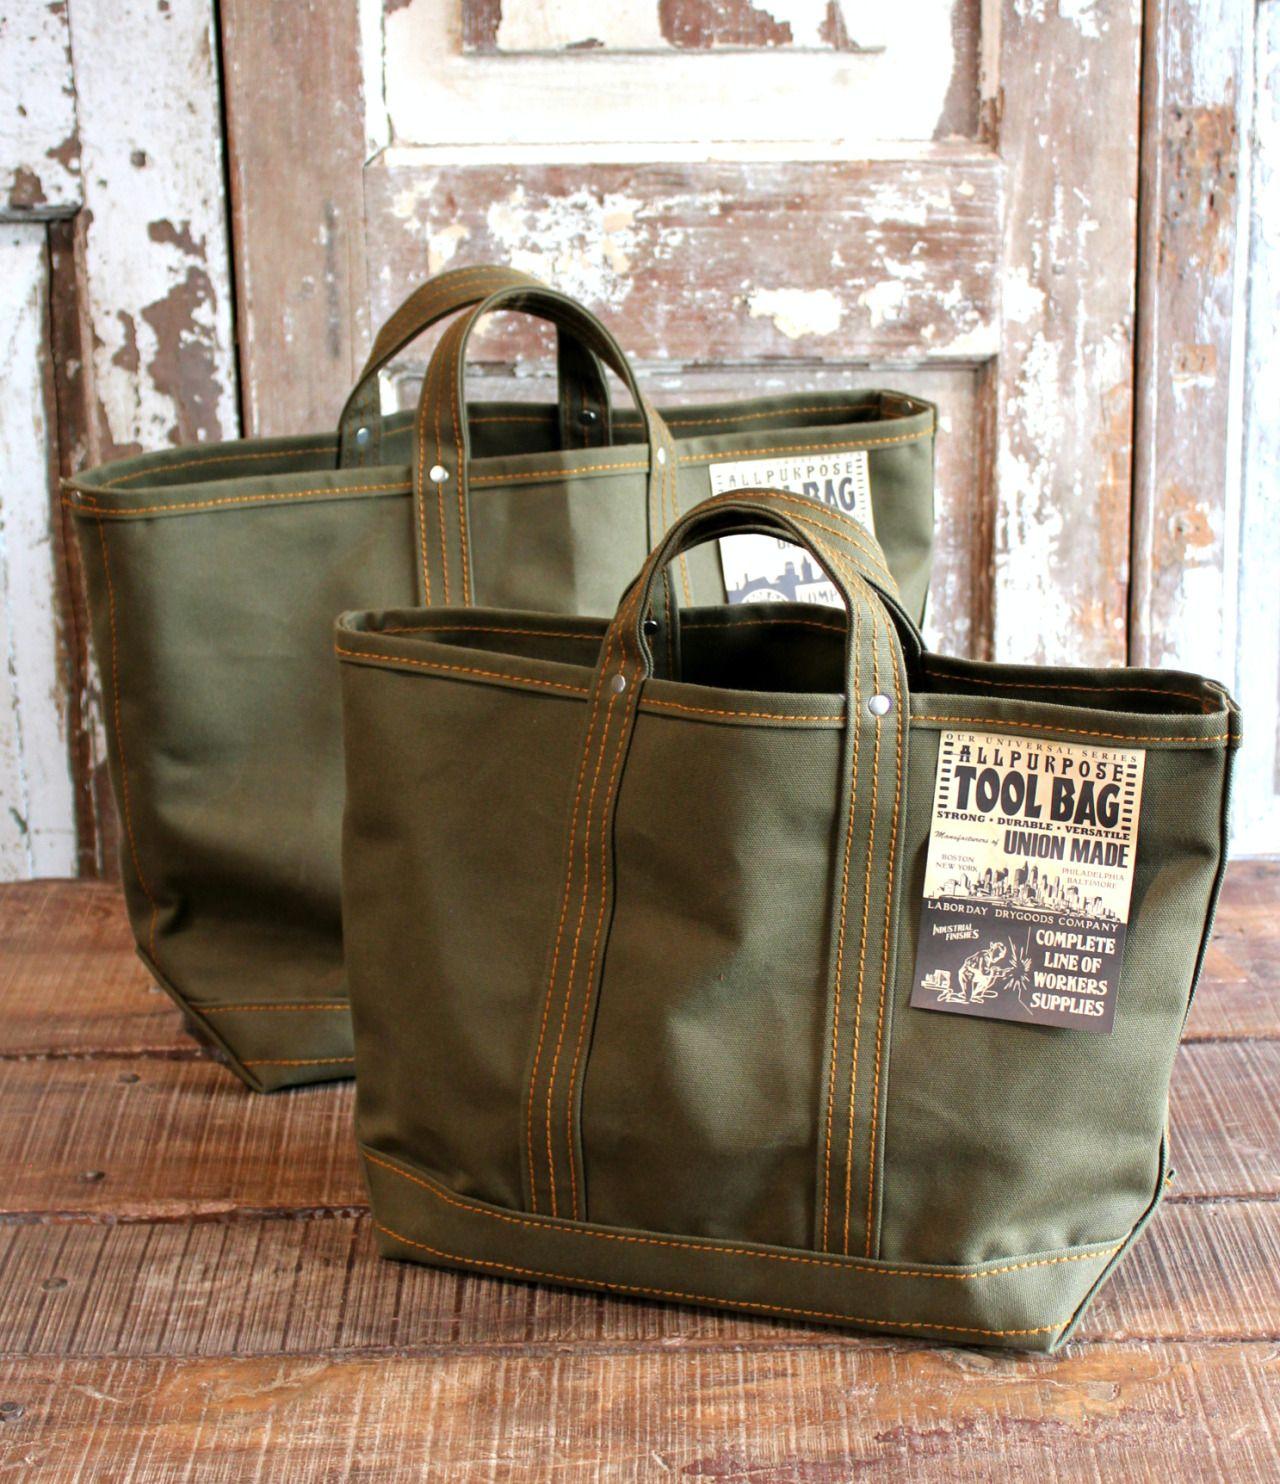 Pin by Chrispian Burks on Bags, Packs   Pouches   Bags, Denim bag ... 20d5c5d1d1